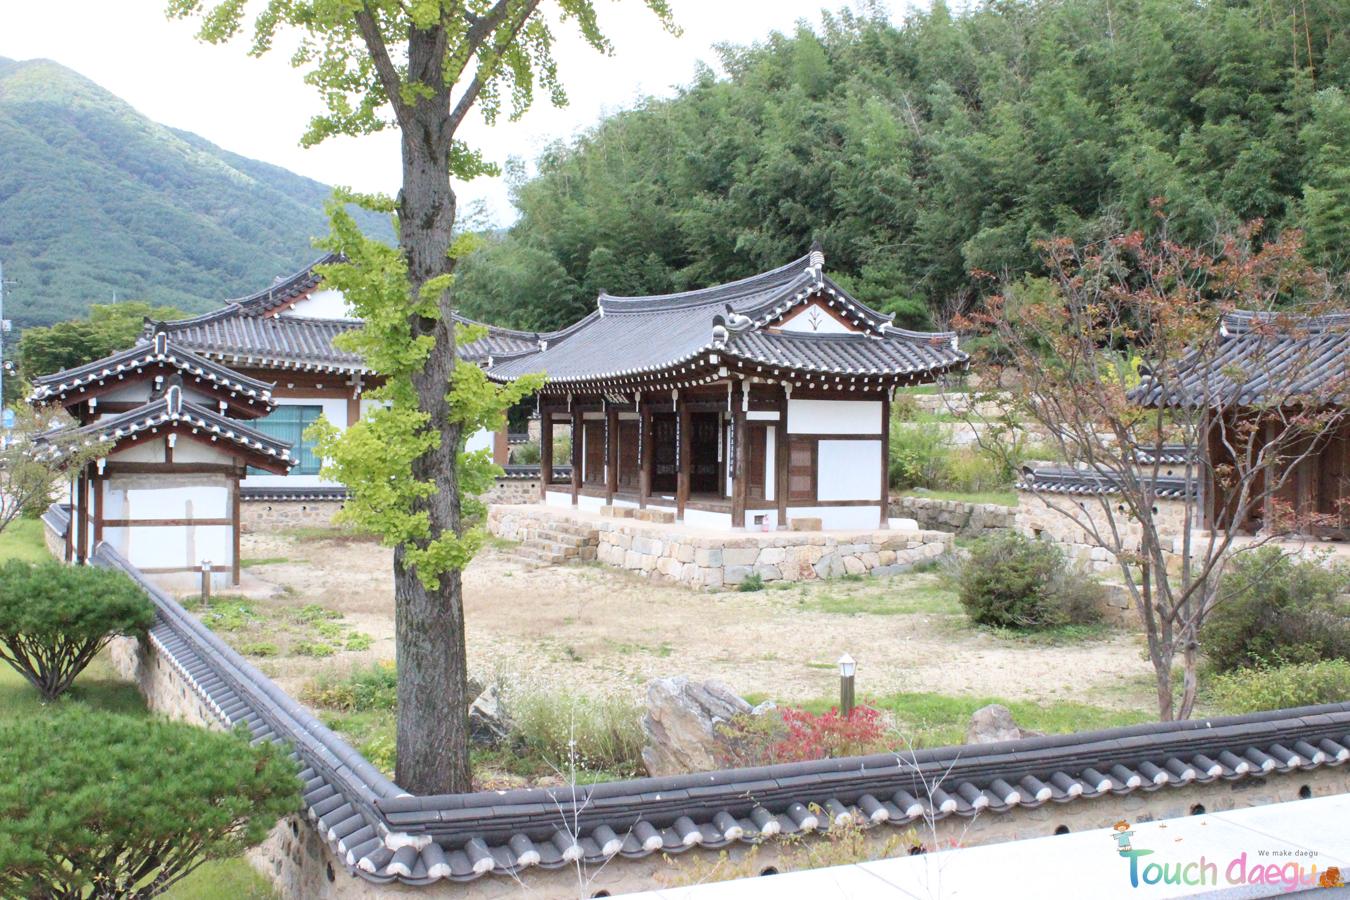 Momyeongjae